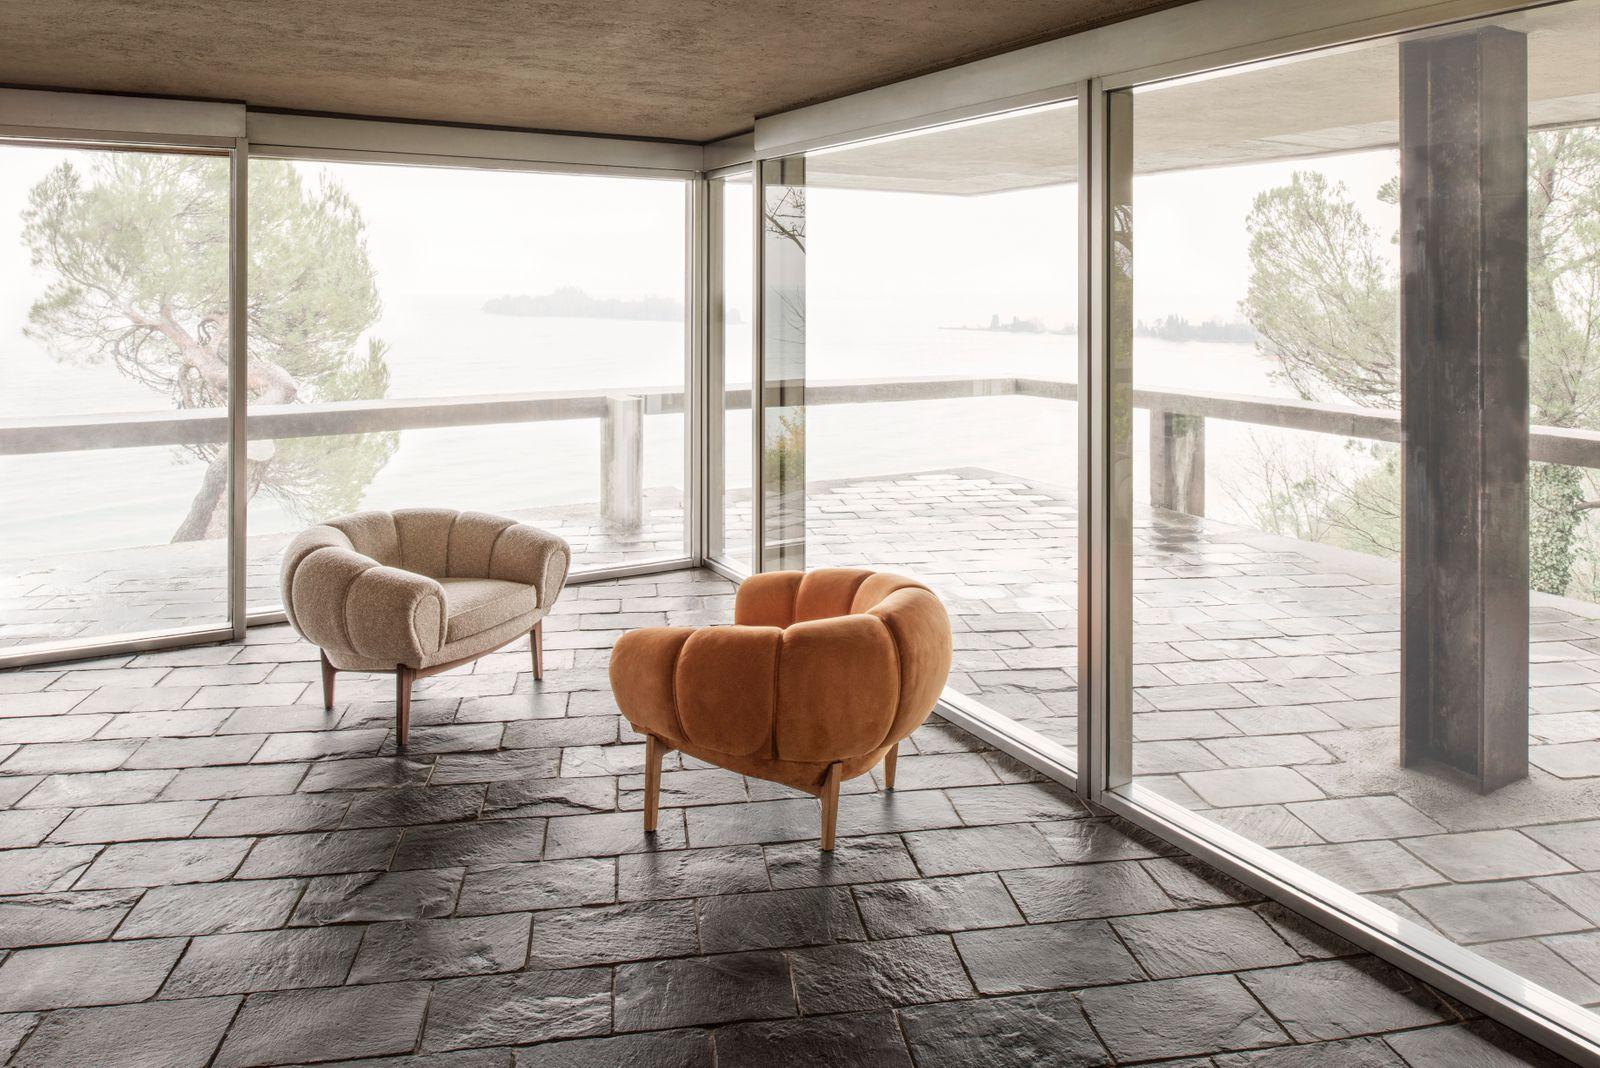 Gubi / Lounge Chair